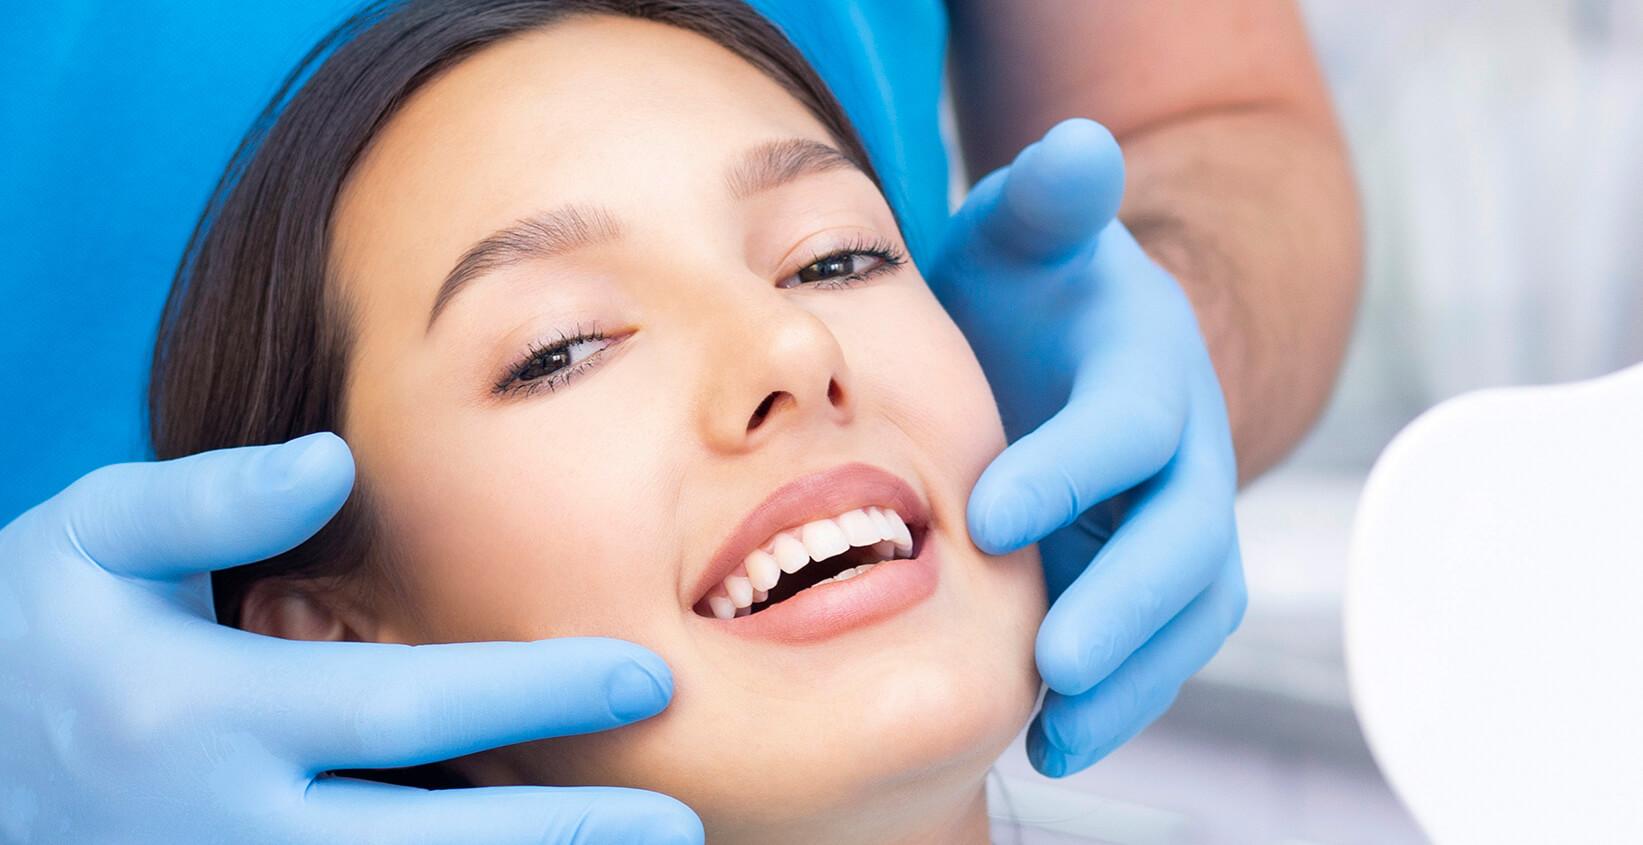 Teeth cleaning and dental care in Manhattan Beach